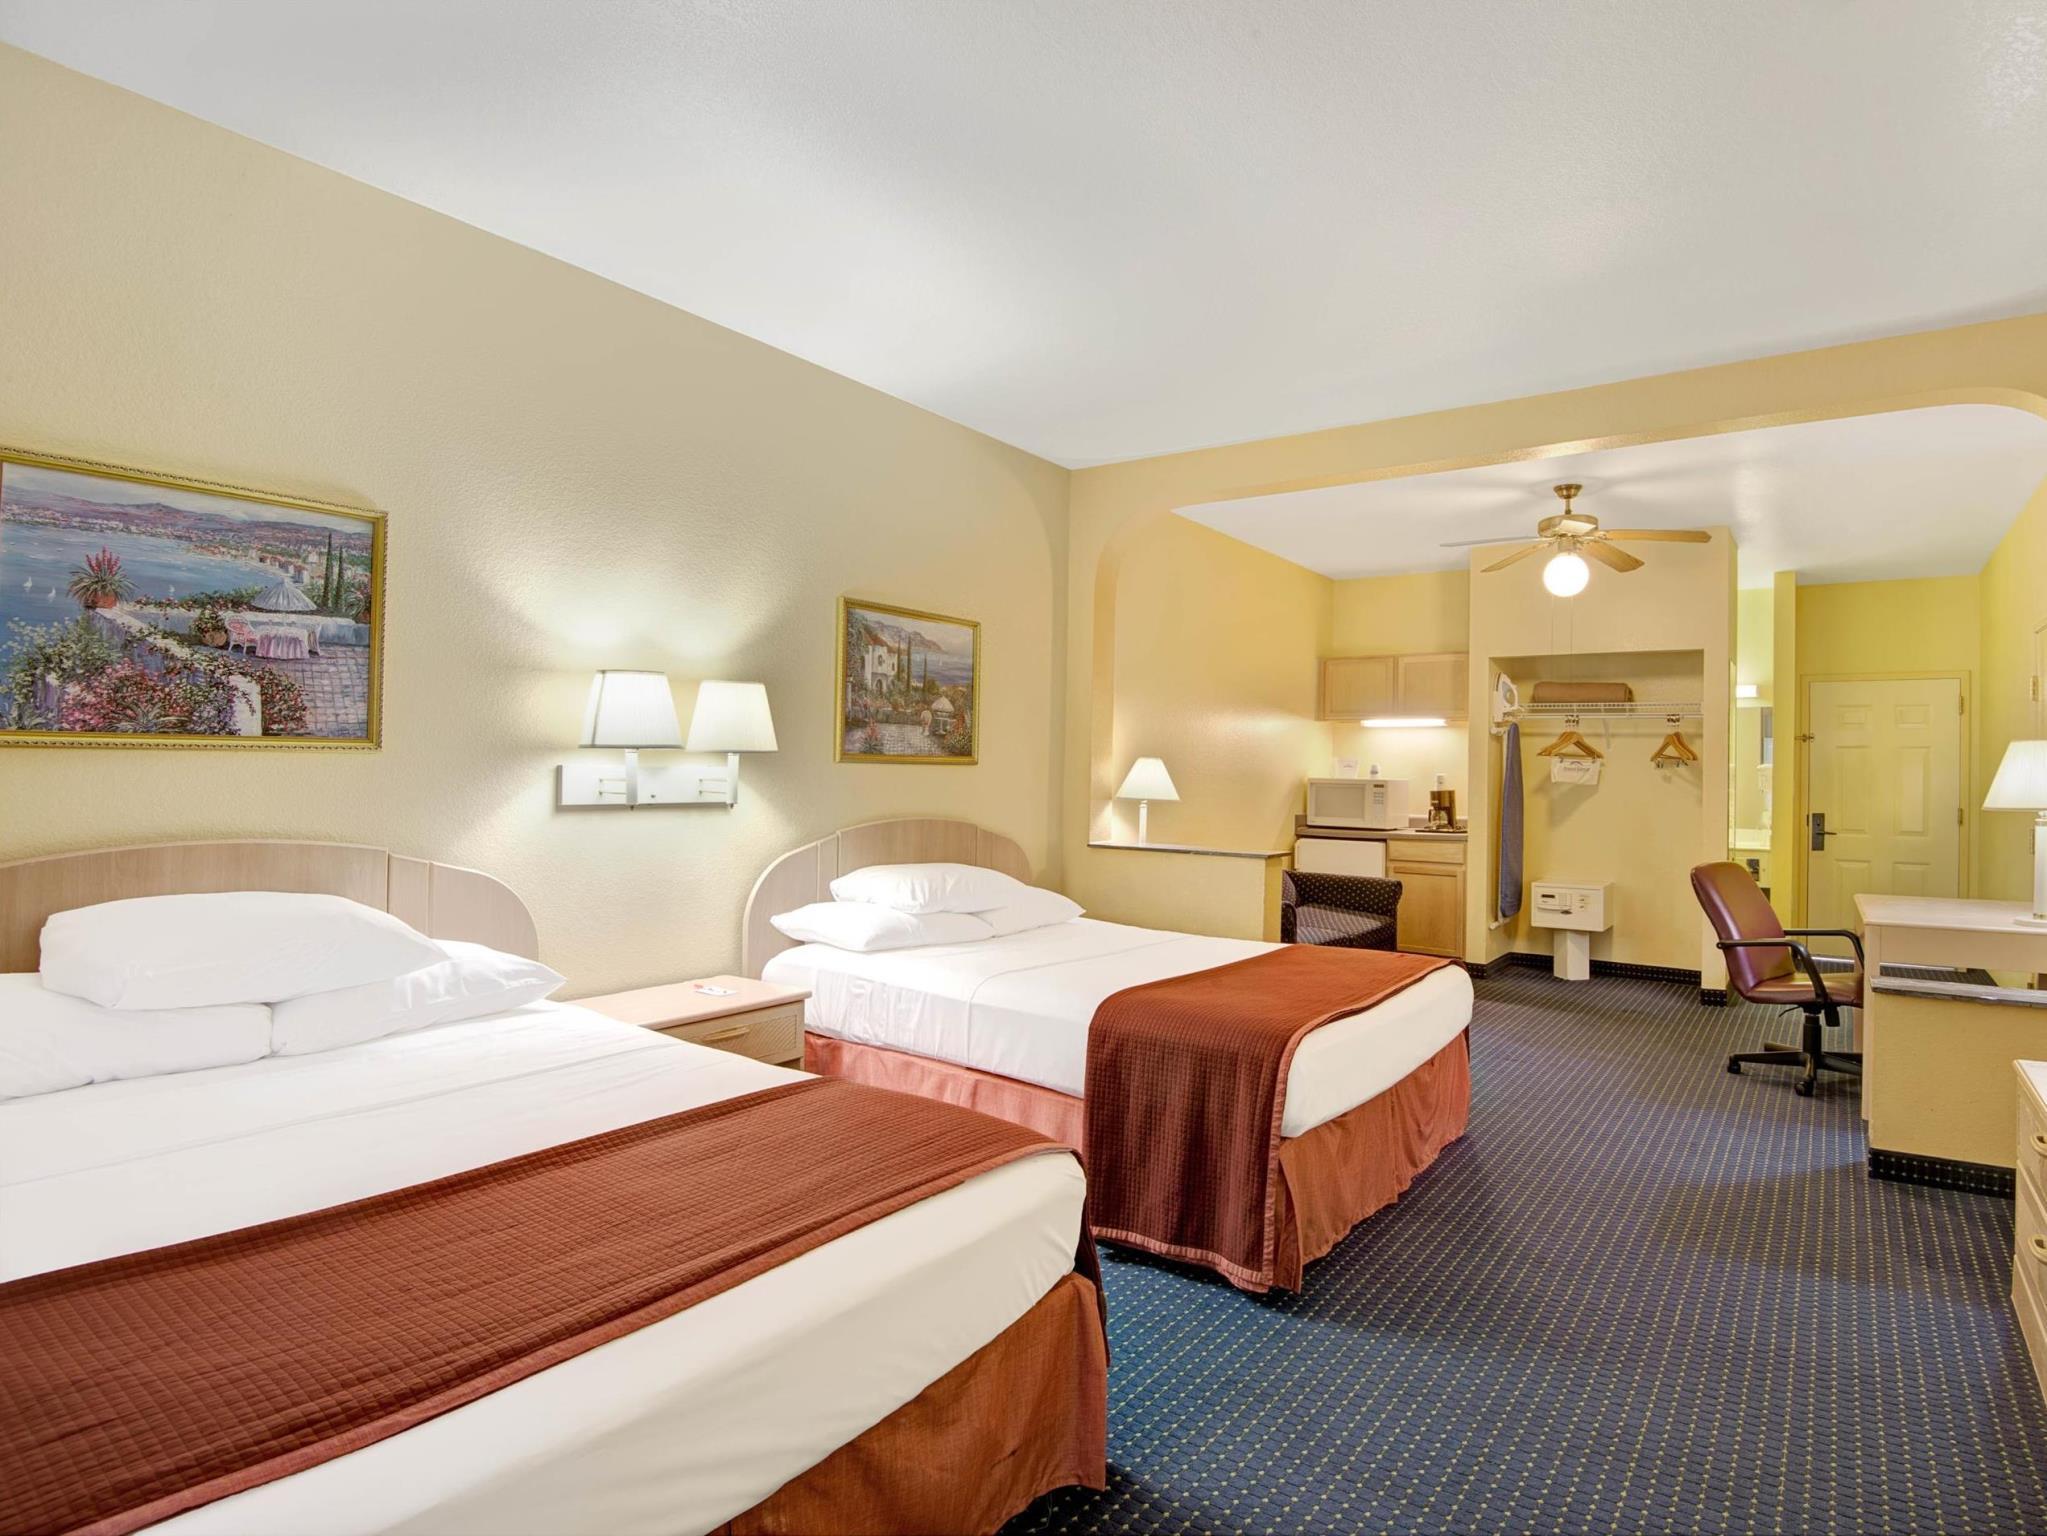 Howard Johnson Hotel & Suites By Wyndham San Antonio